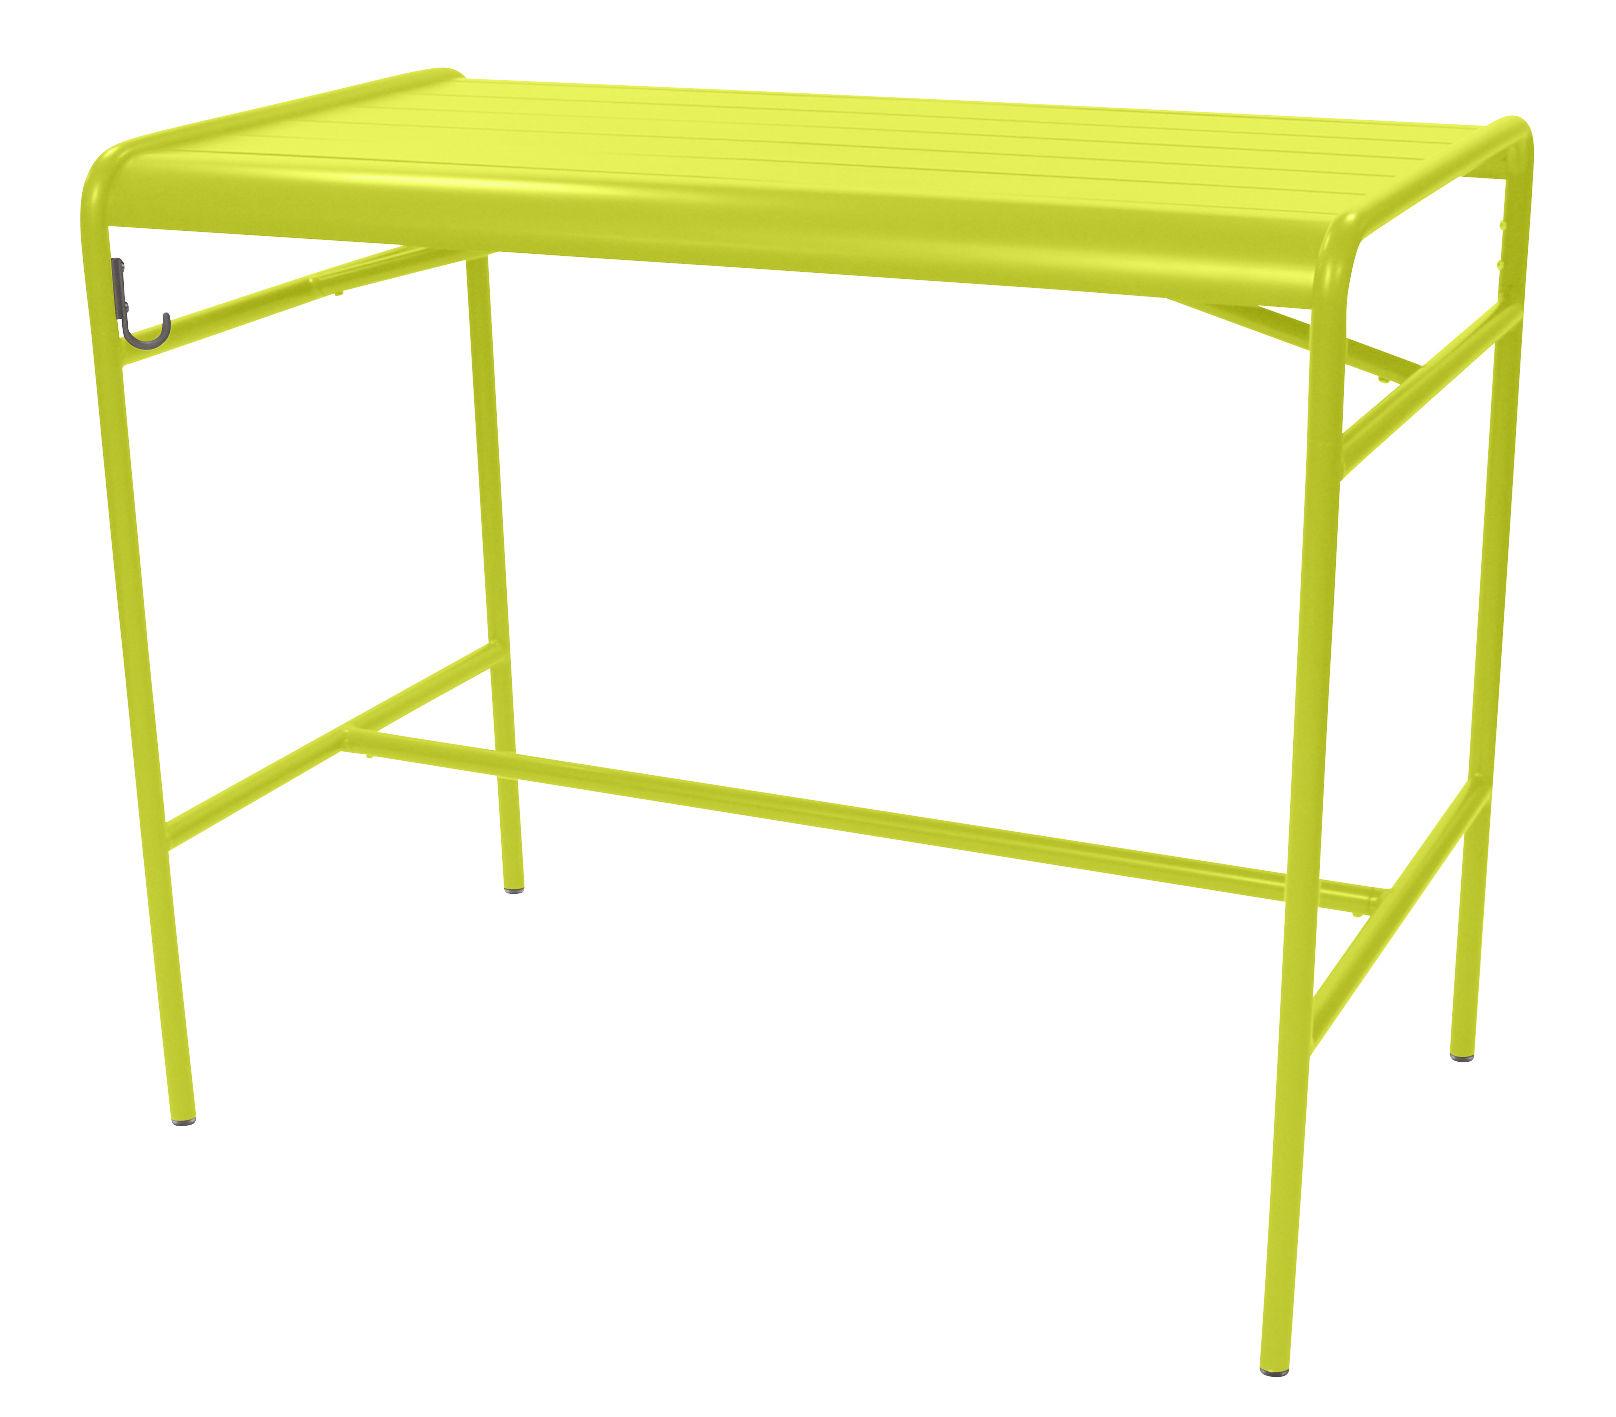 table haute luxembourg 4 personnes 126 x 73 cm aluminium verveine fermob. Black Bedroom Furniture Sets. Home Design Ideas